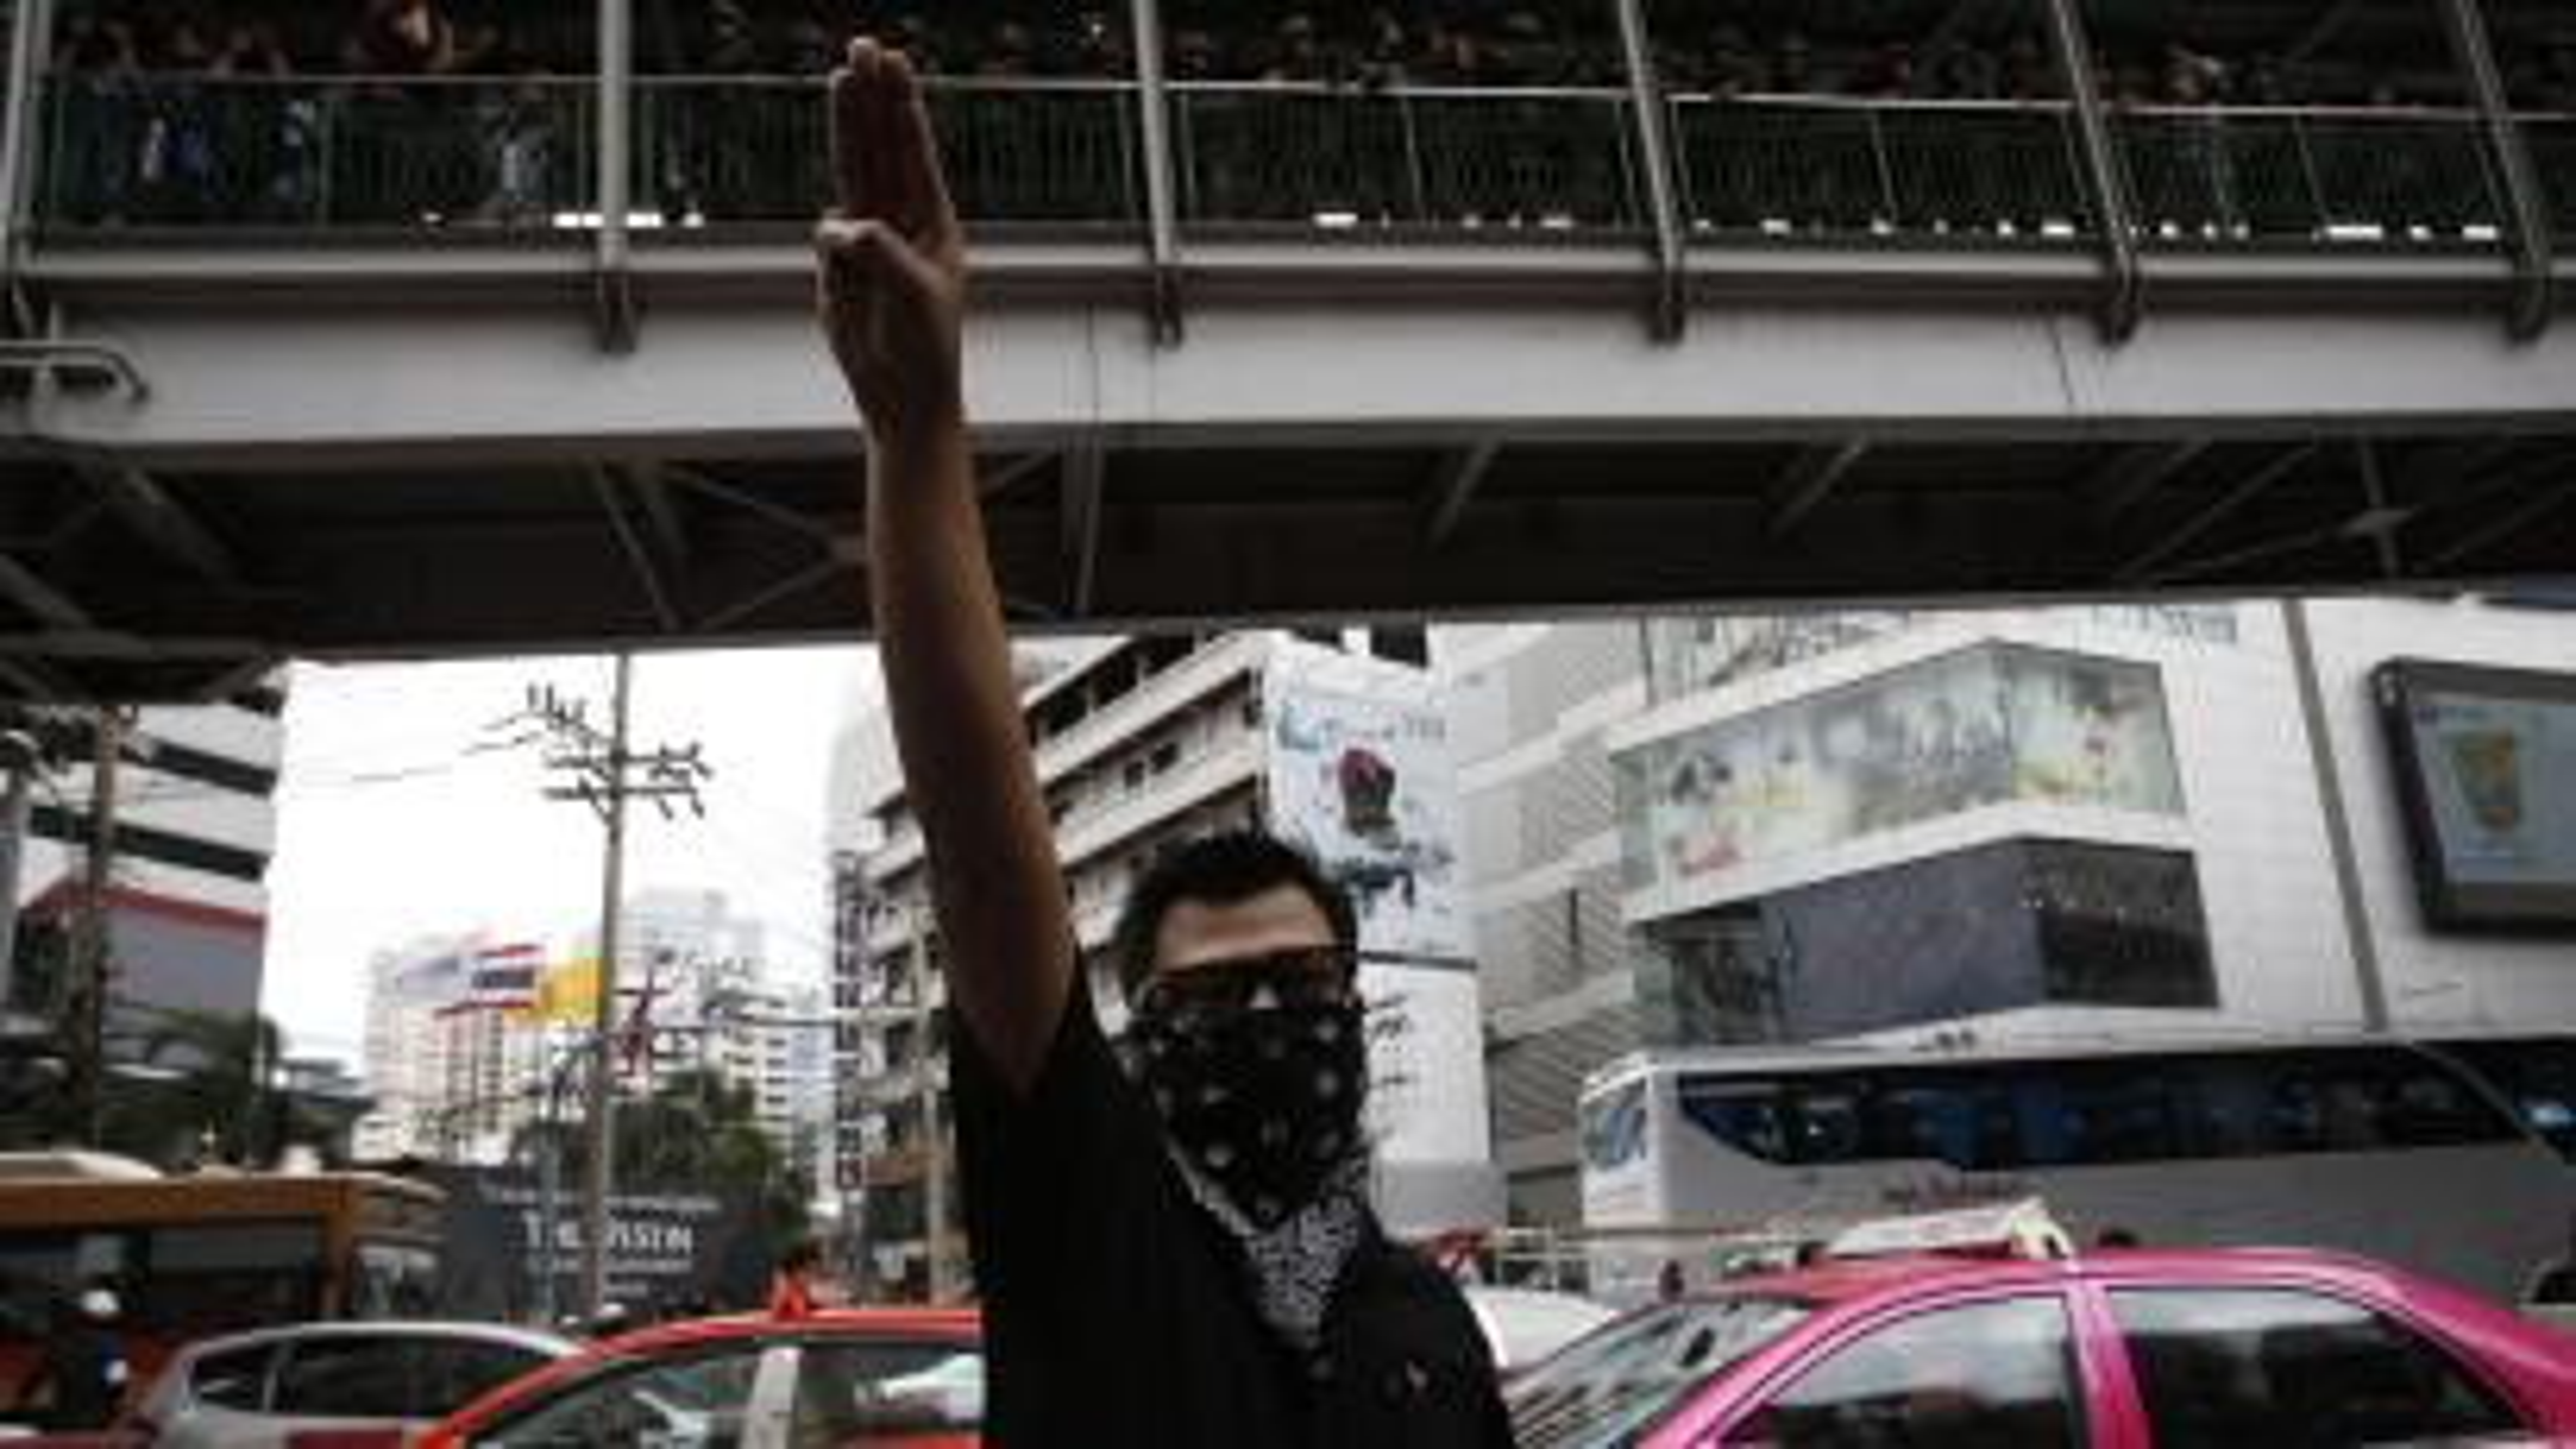 Thai Hunger Games salute